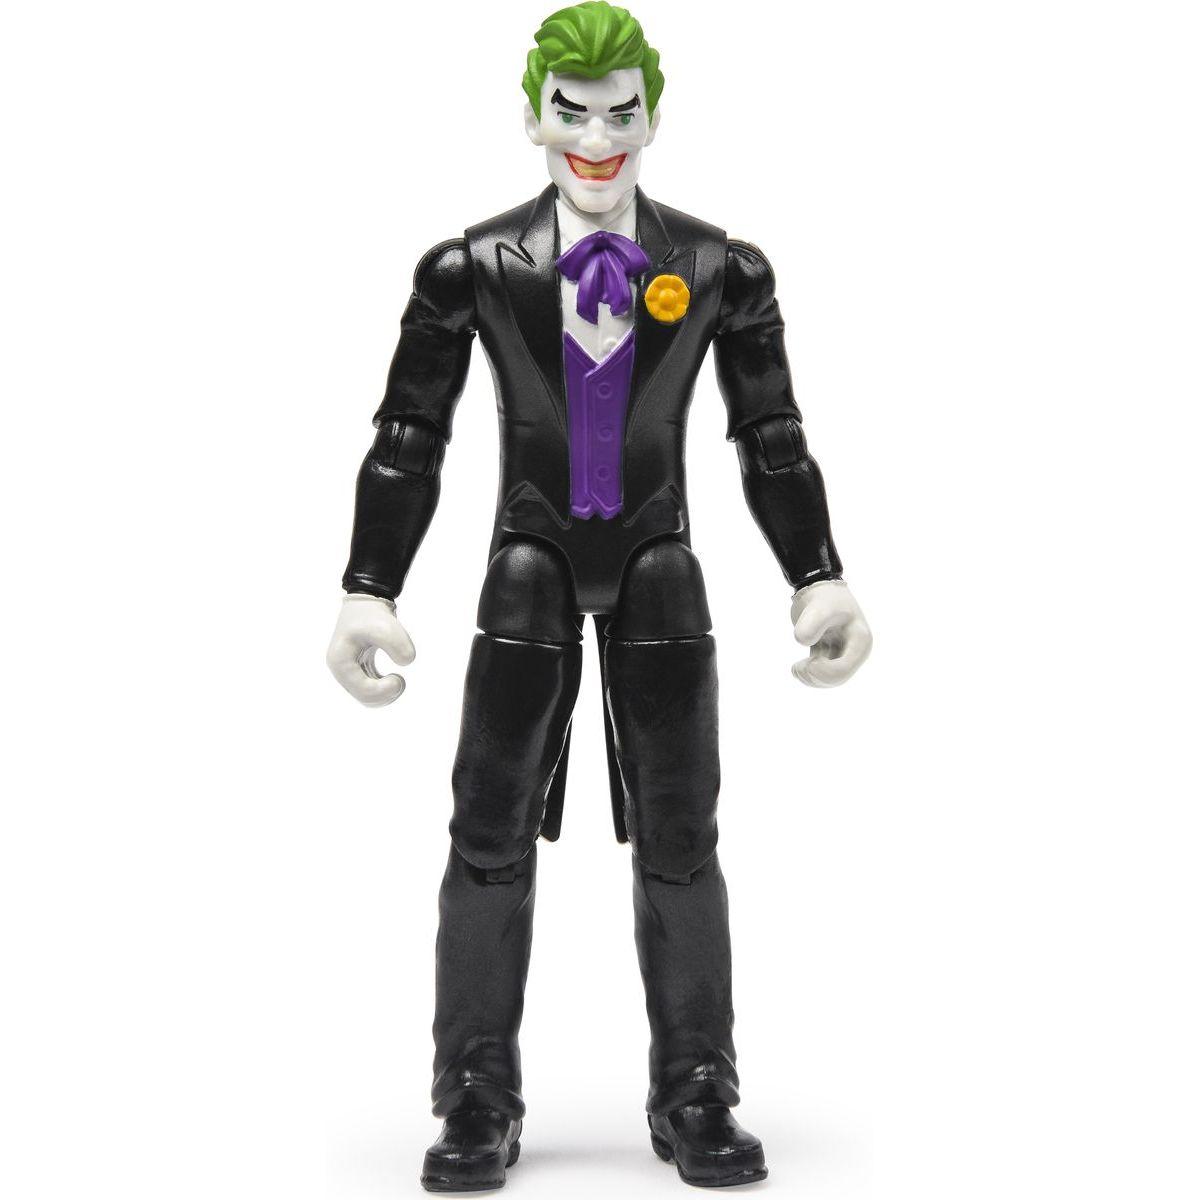 Spin Master Batman figurky hrdinů s doplňky 10 cm The Joker in black